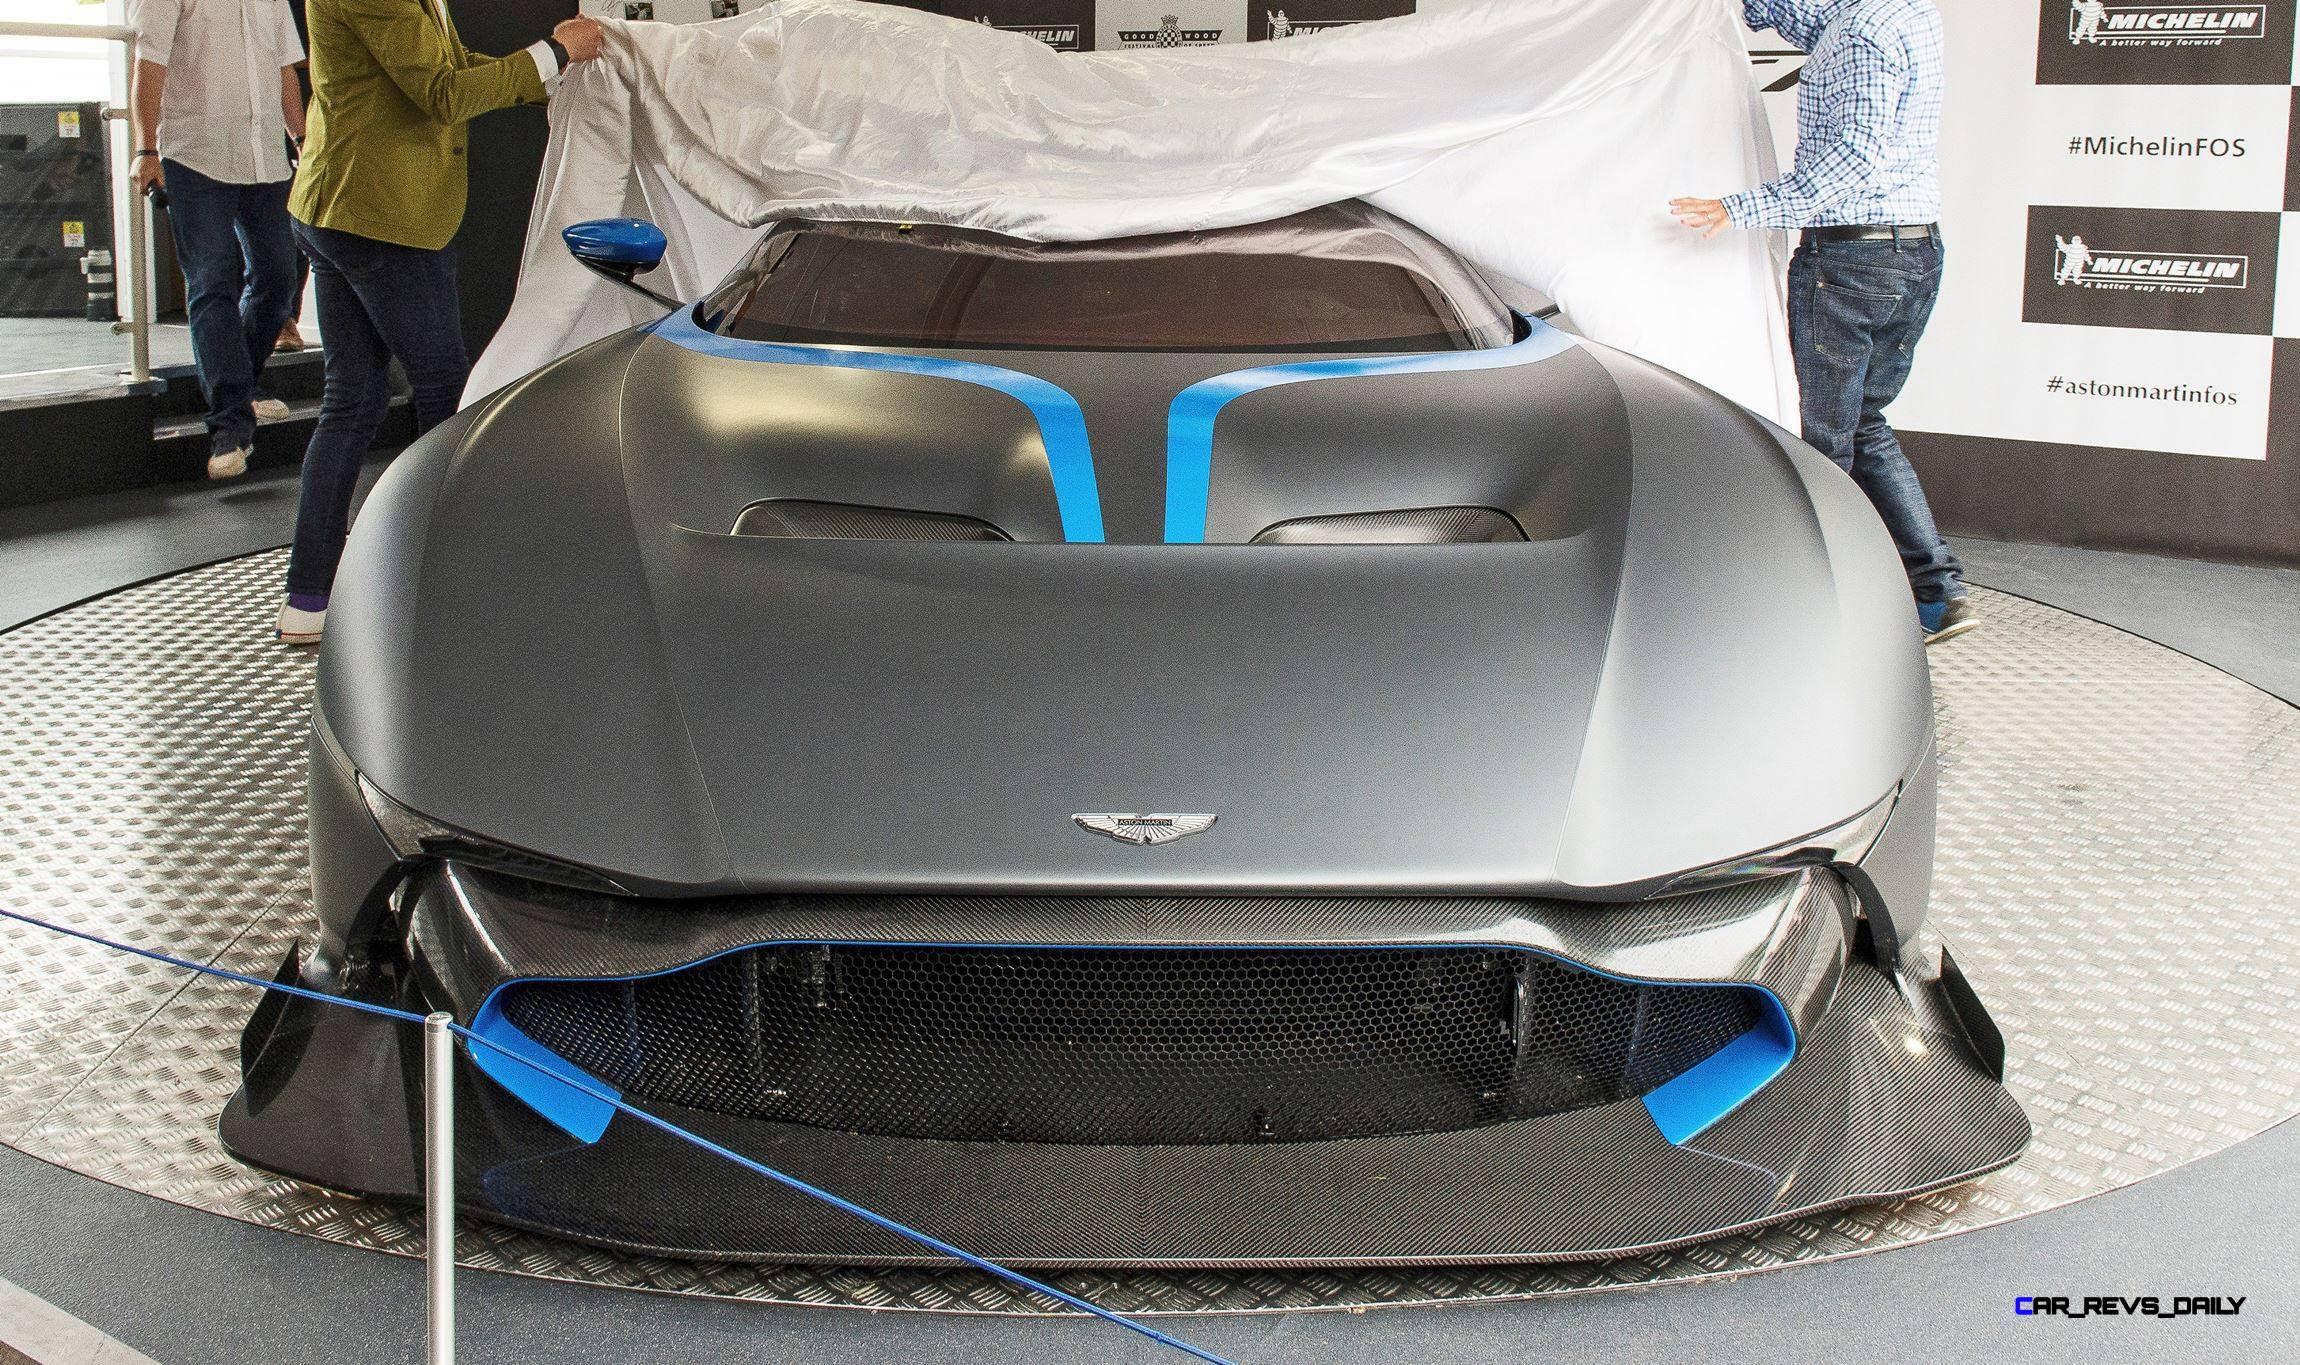 Aston Martin Vulcan Vs Mclaren P1 Prost